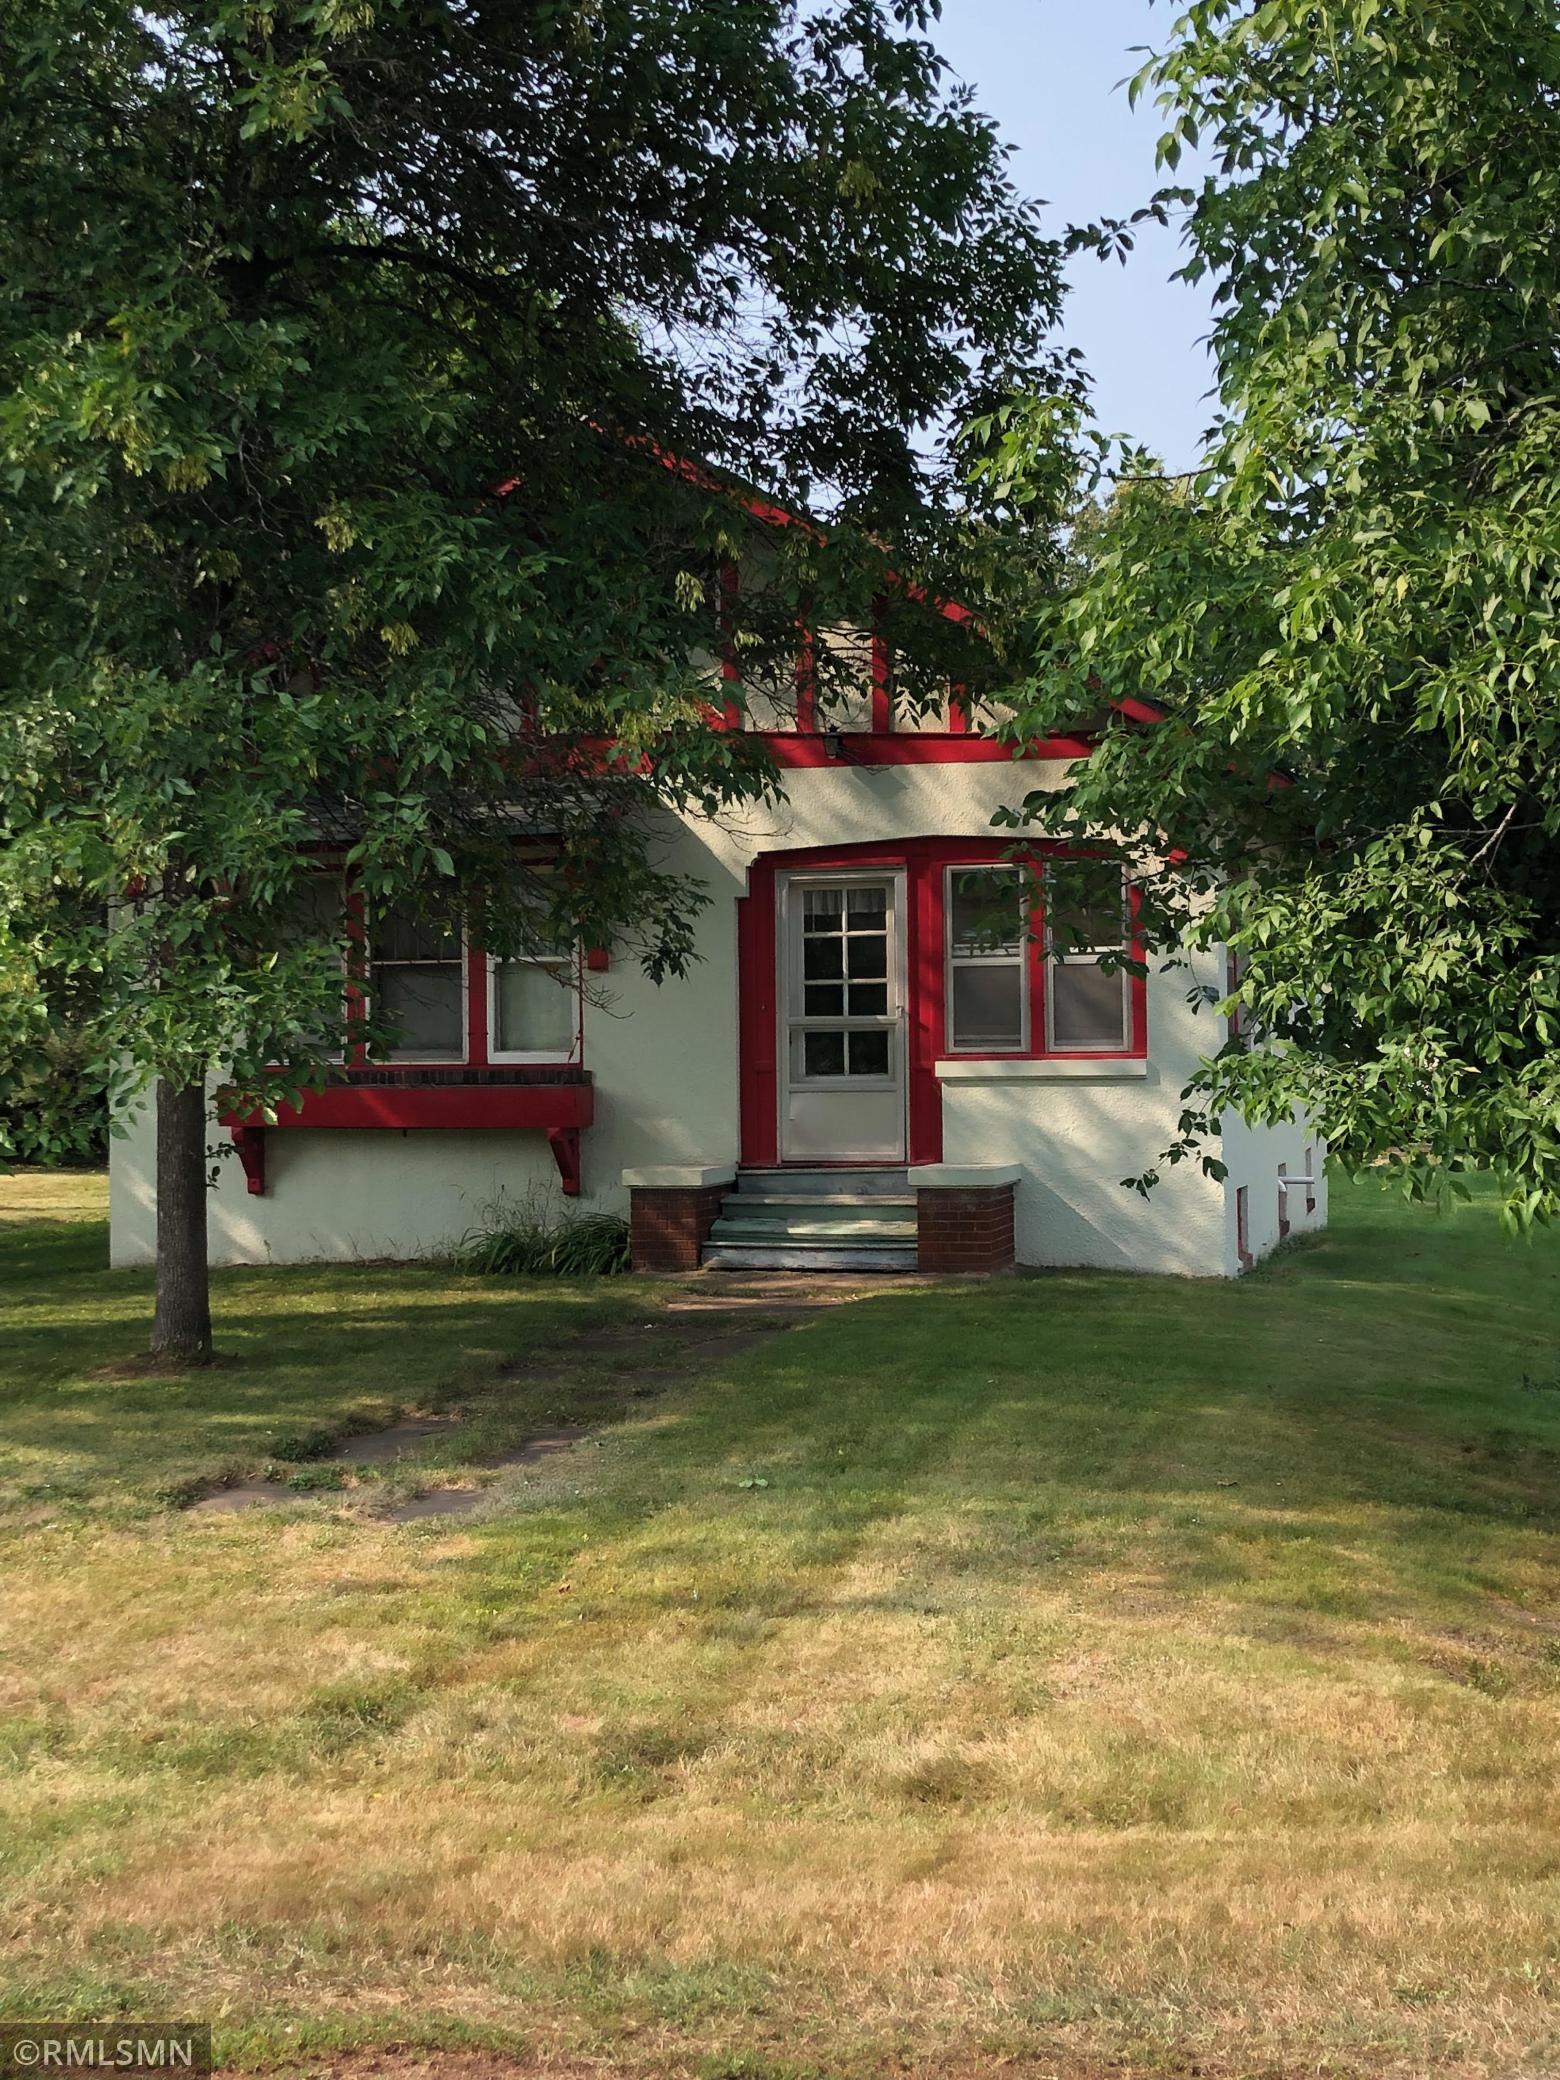 3531 Bregnedalgade Property Photo - Askov, MN real estate listing